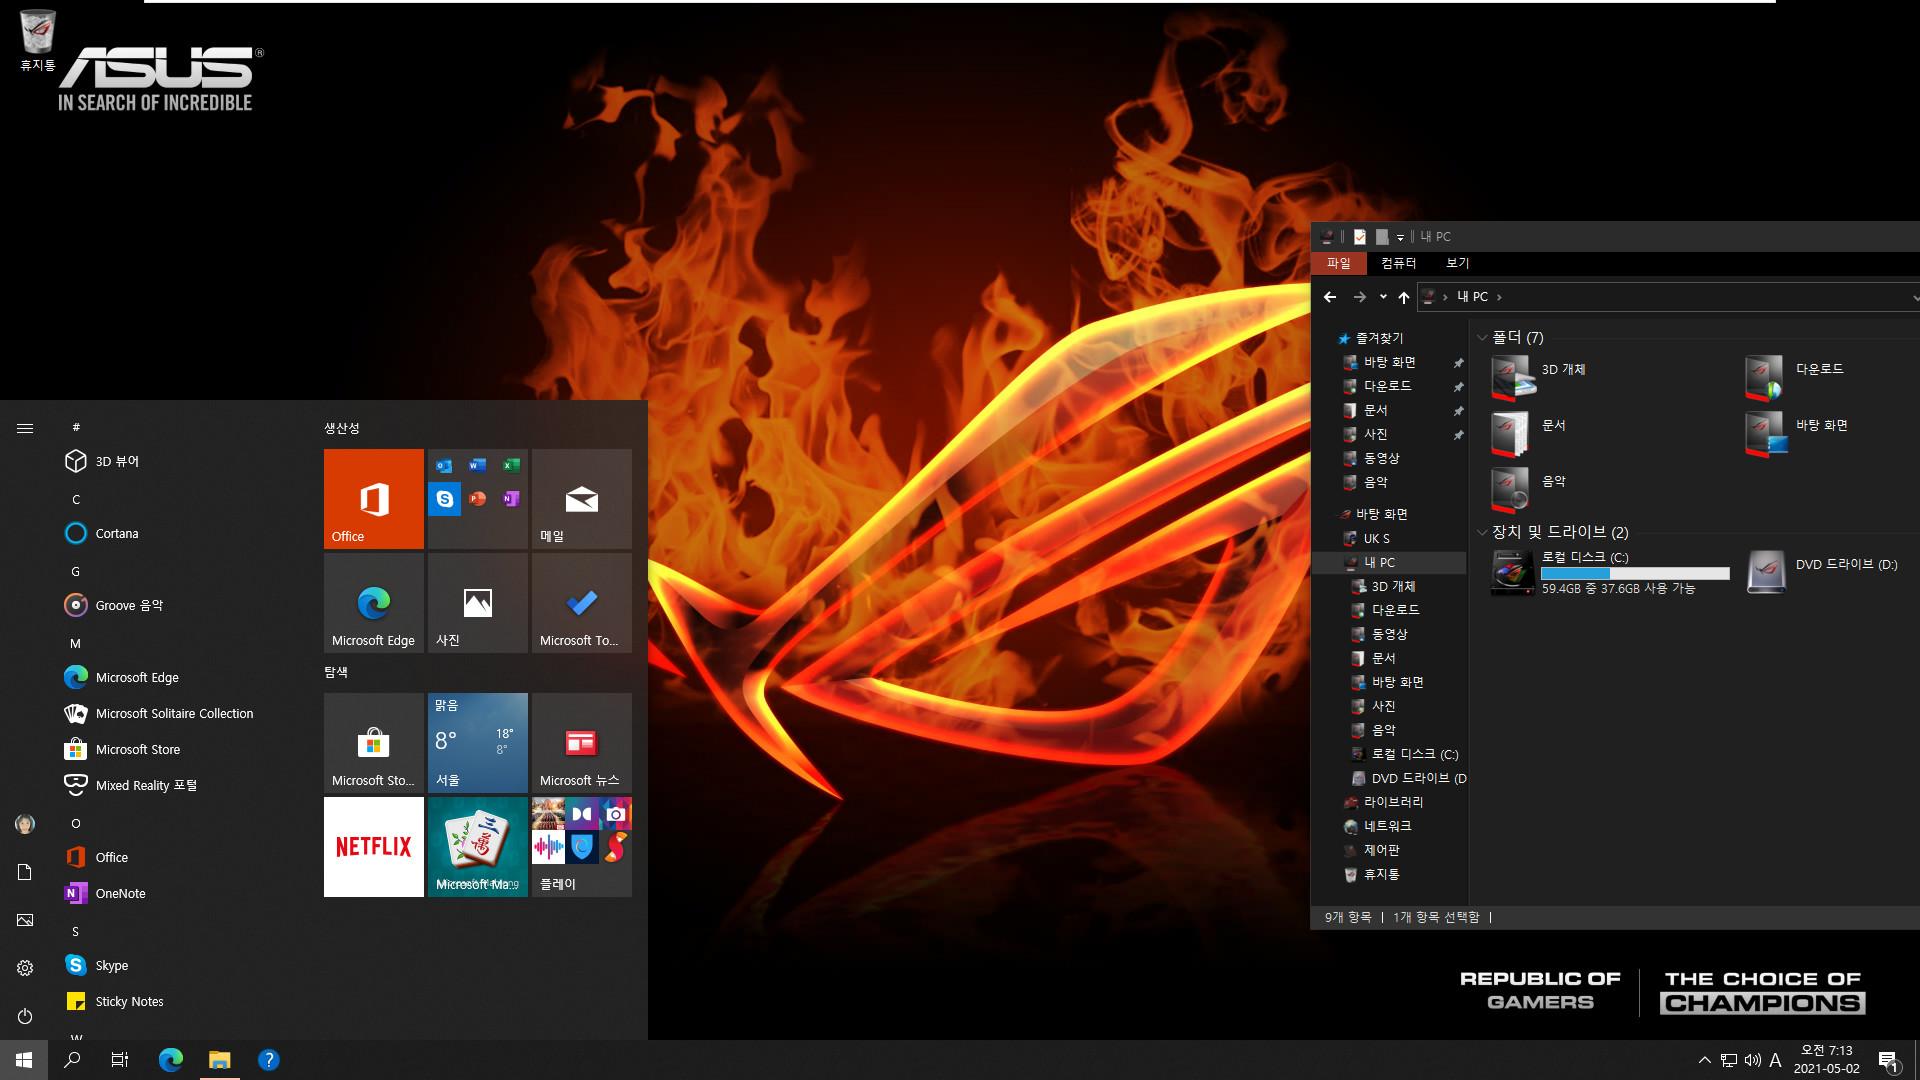 imageres.dll적용 테스트 - Windows 10 ROG 감성일까요 2021-05-02_071347.jpg